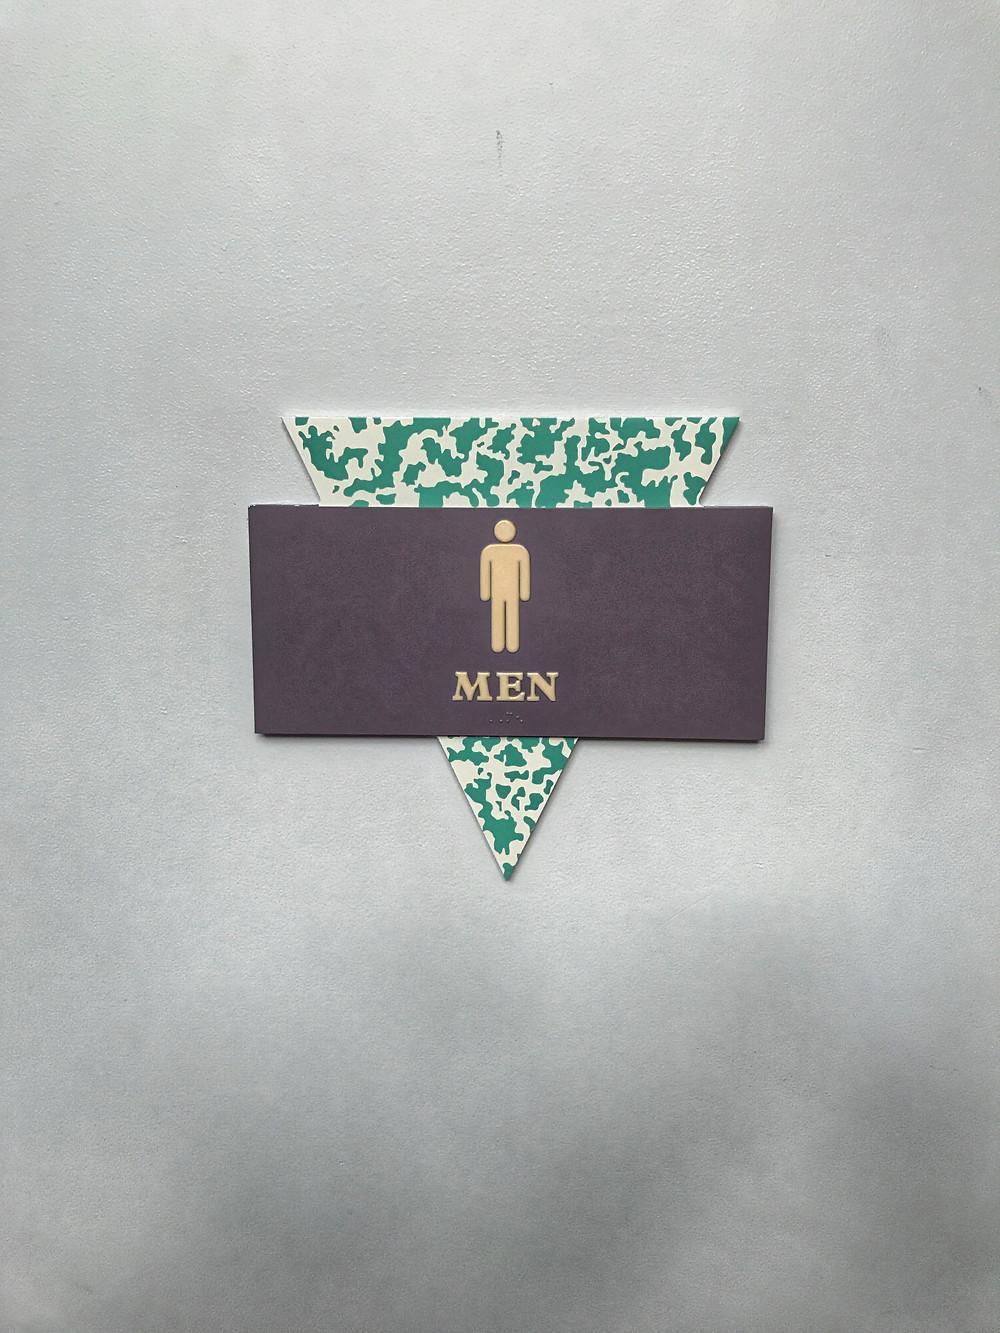 Men's Room Sign, Wonders of Life Pavilion, Epcot